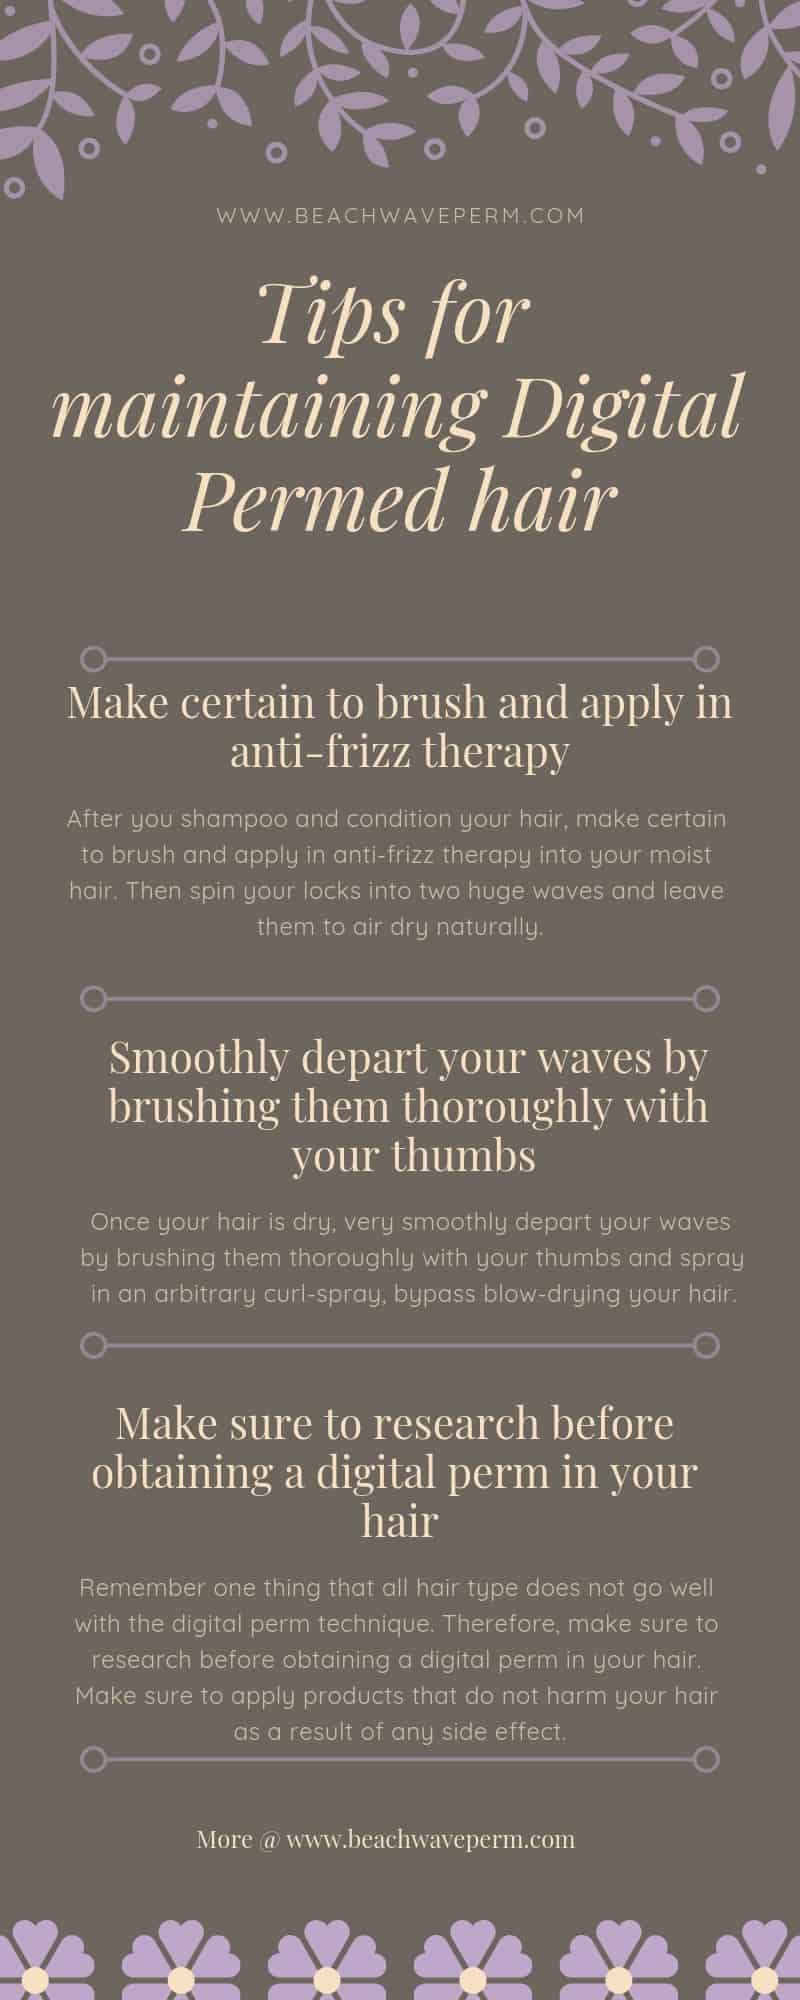 Tips for maintaining Digital Permed hair